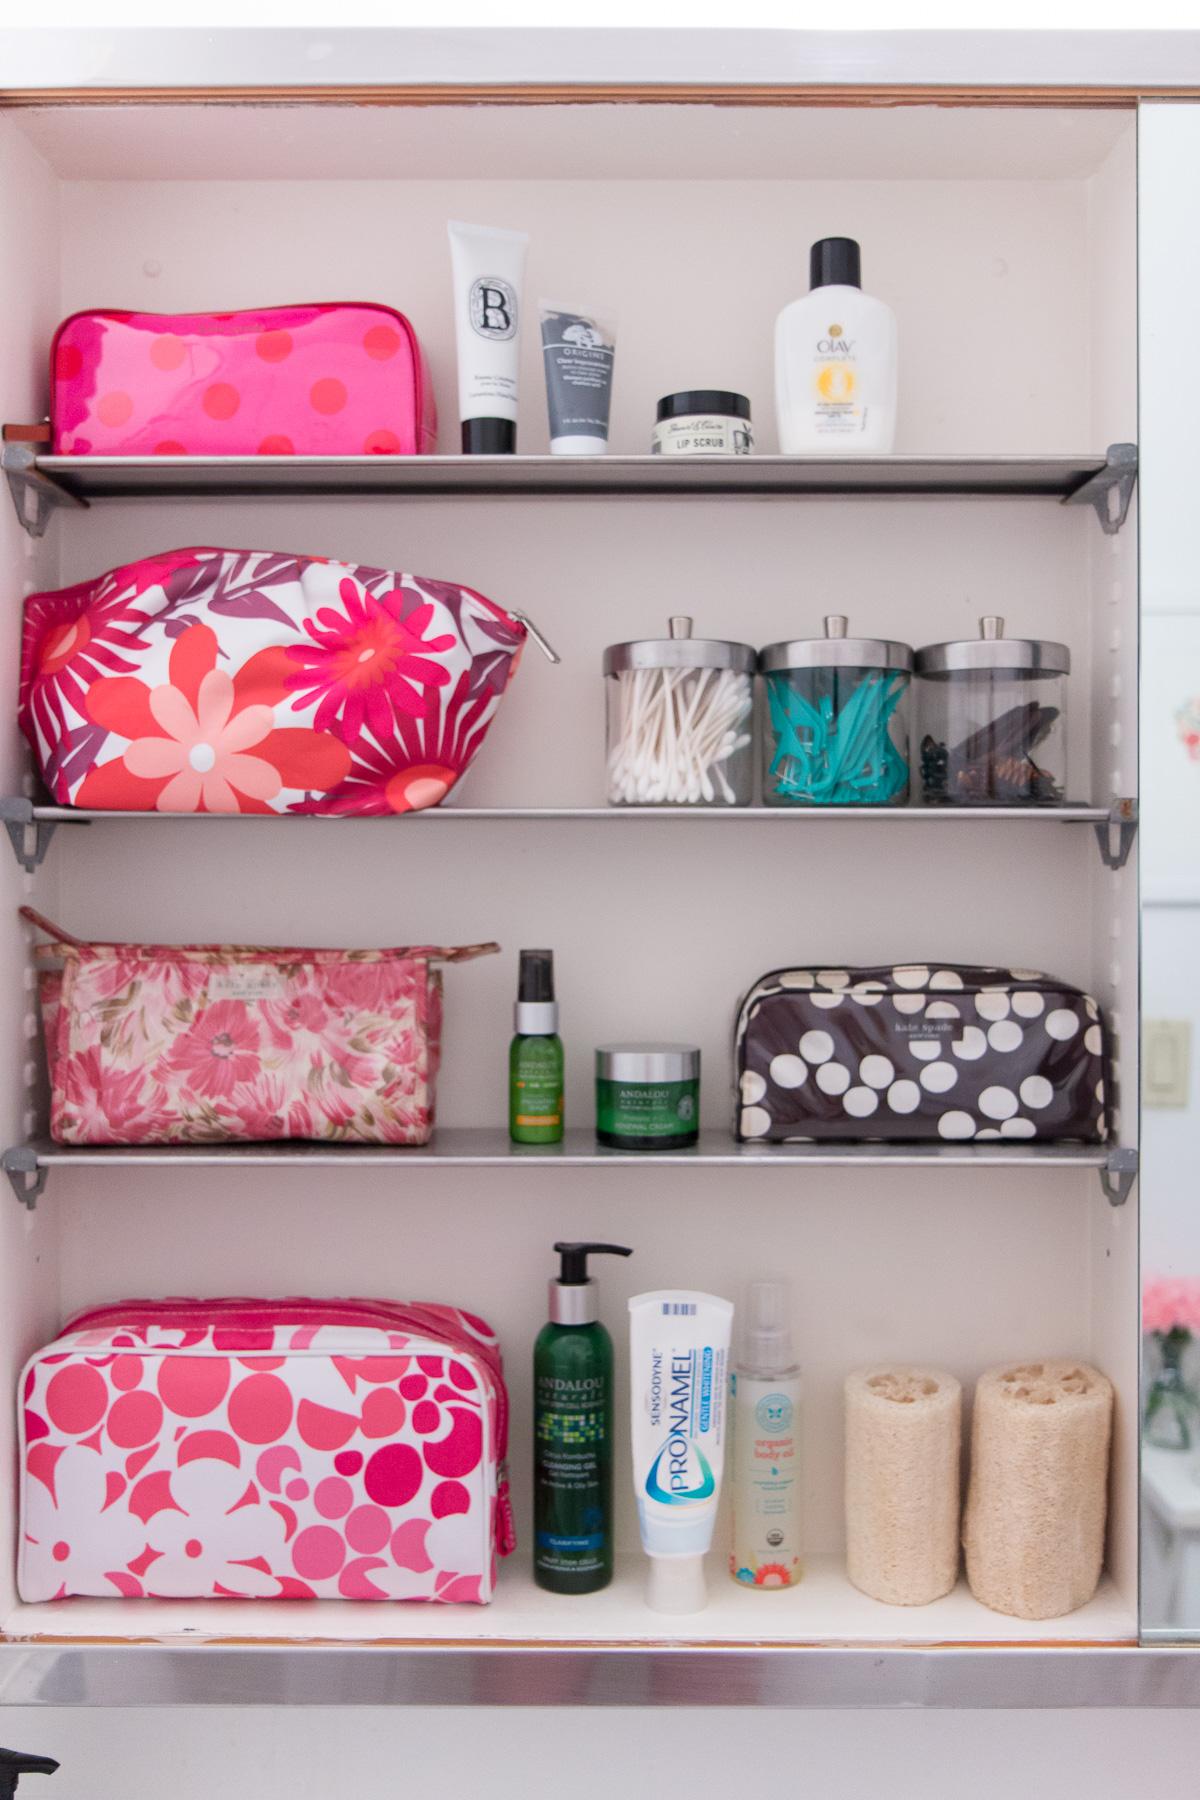 How to Organize a Small Bathroom - York Avenue